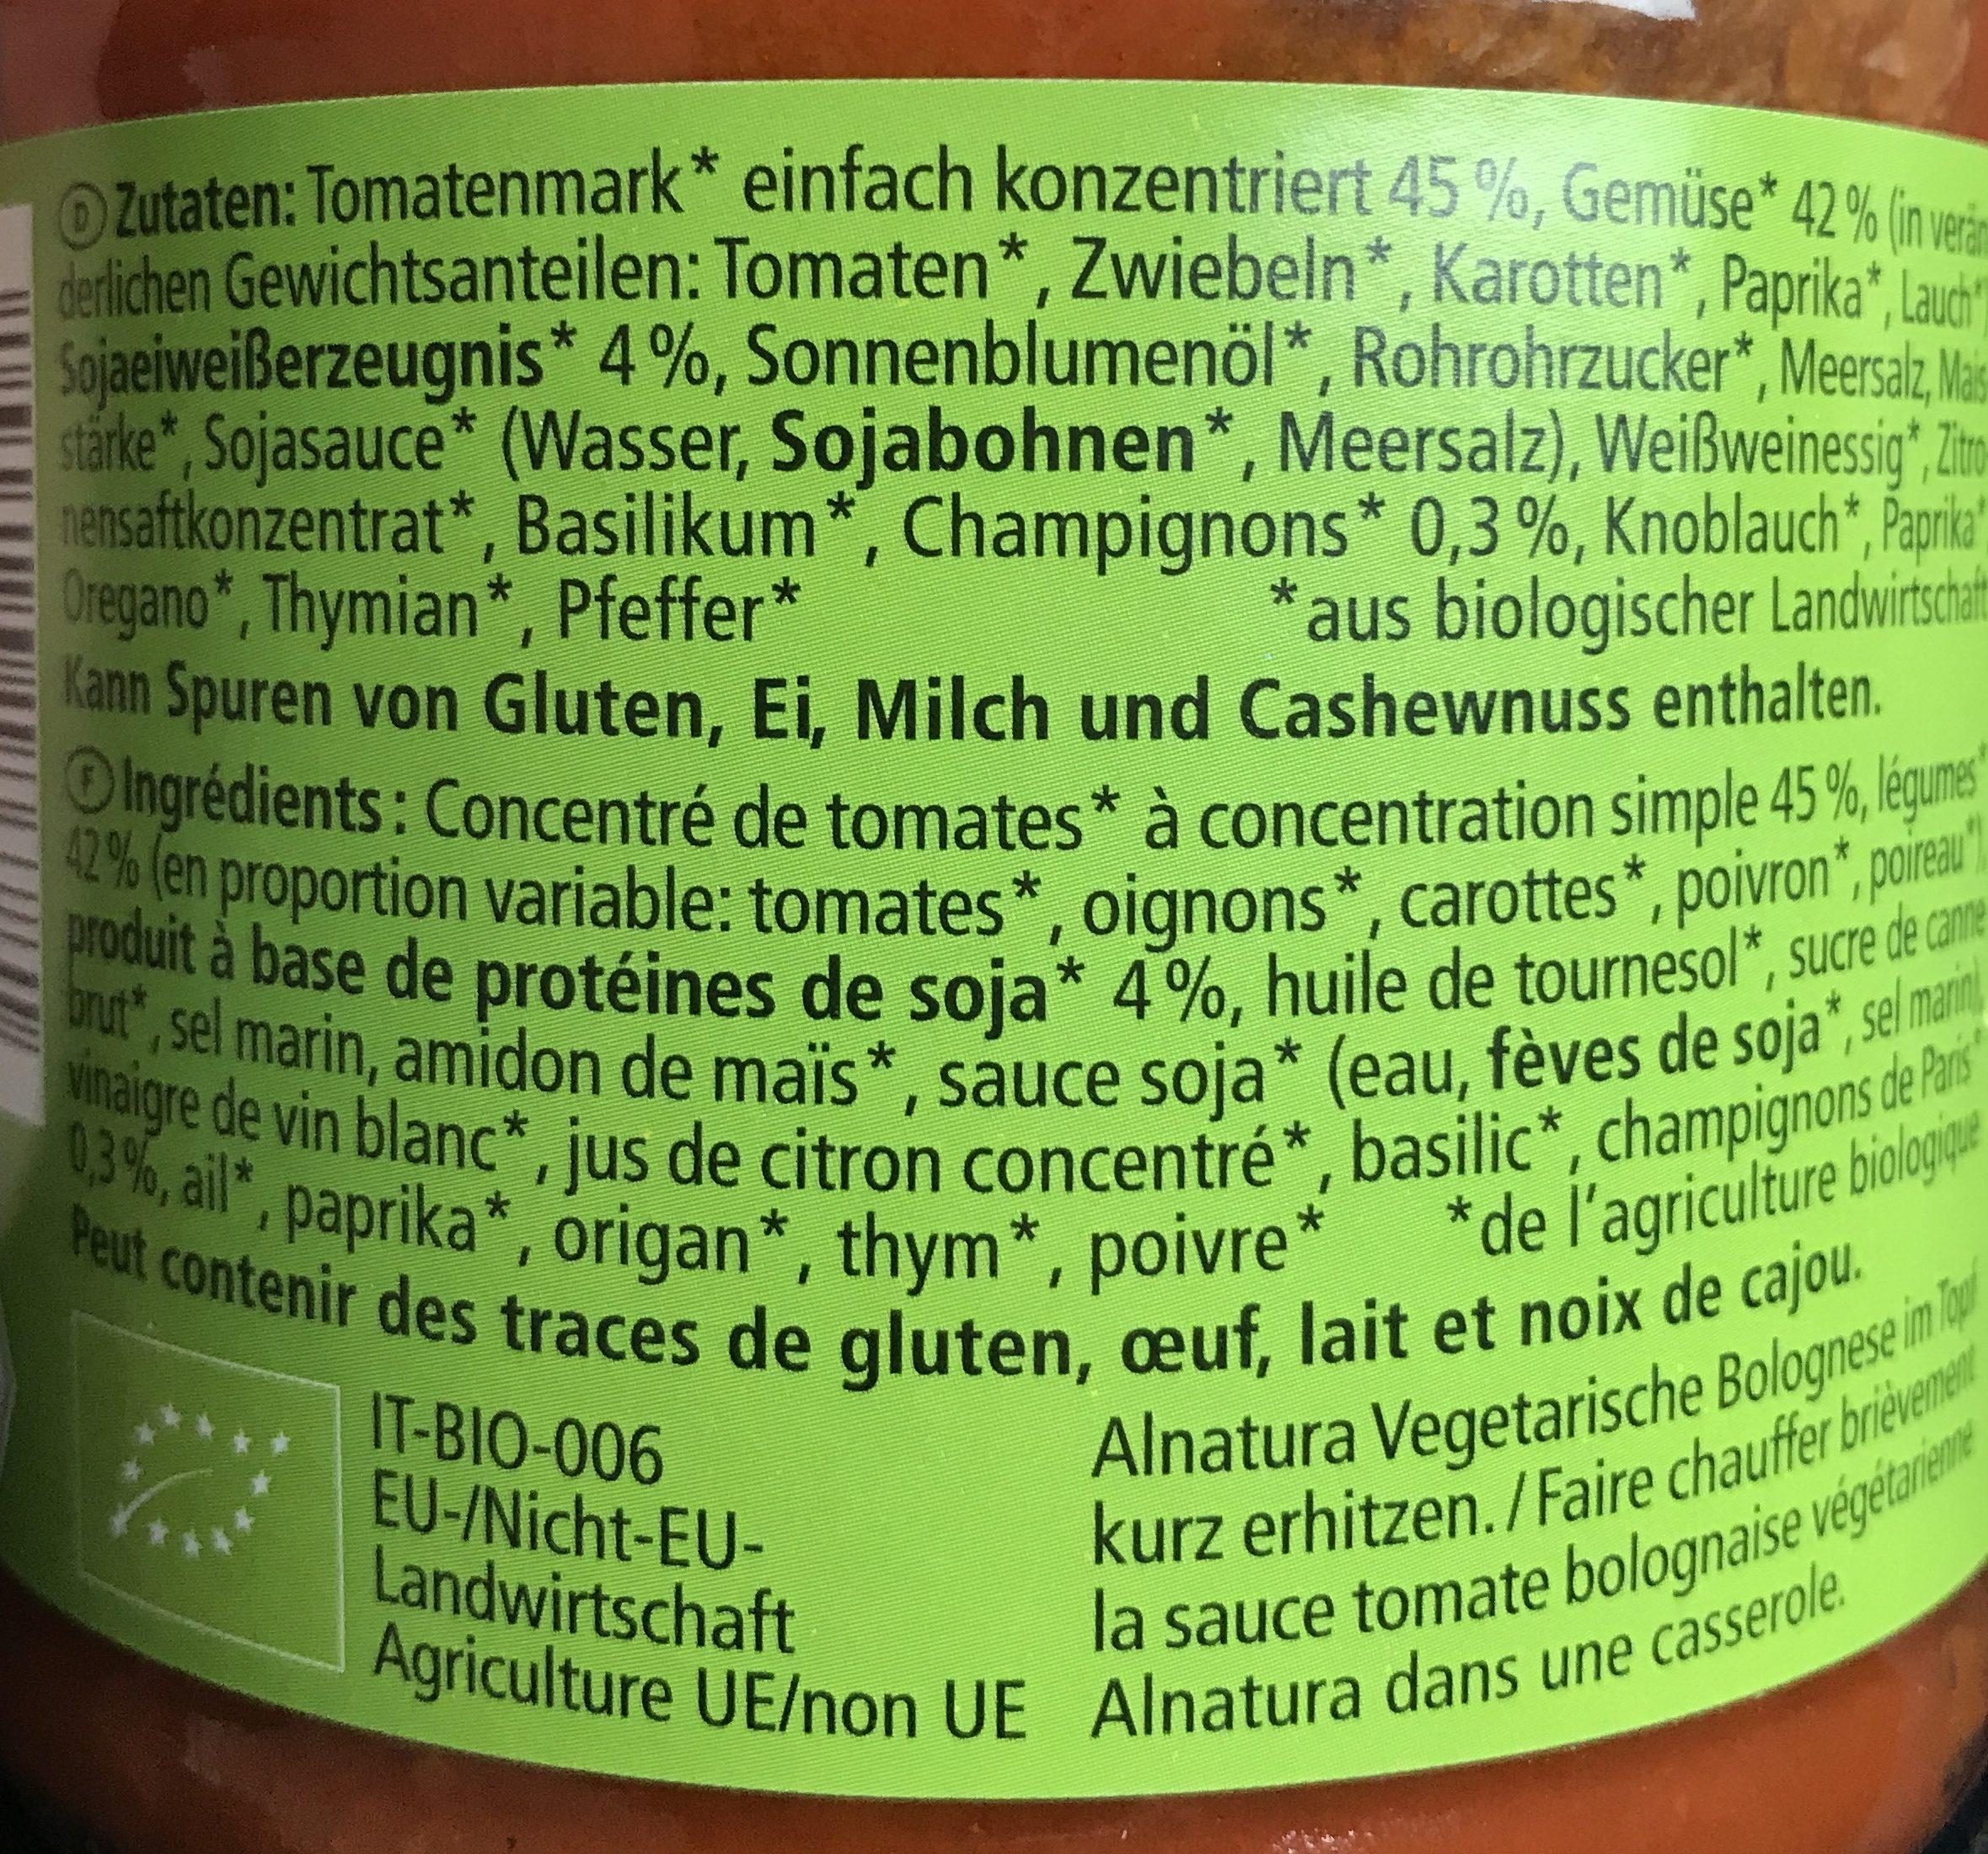 Bolognaise végétarienne - Ingrediënten - fr